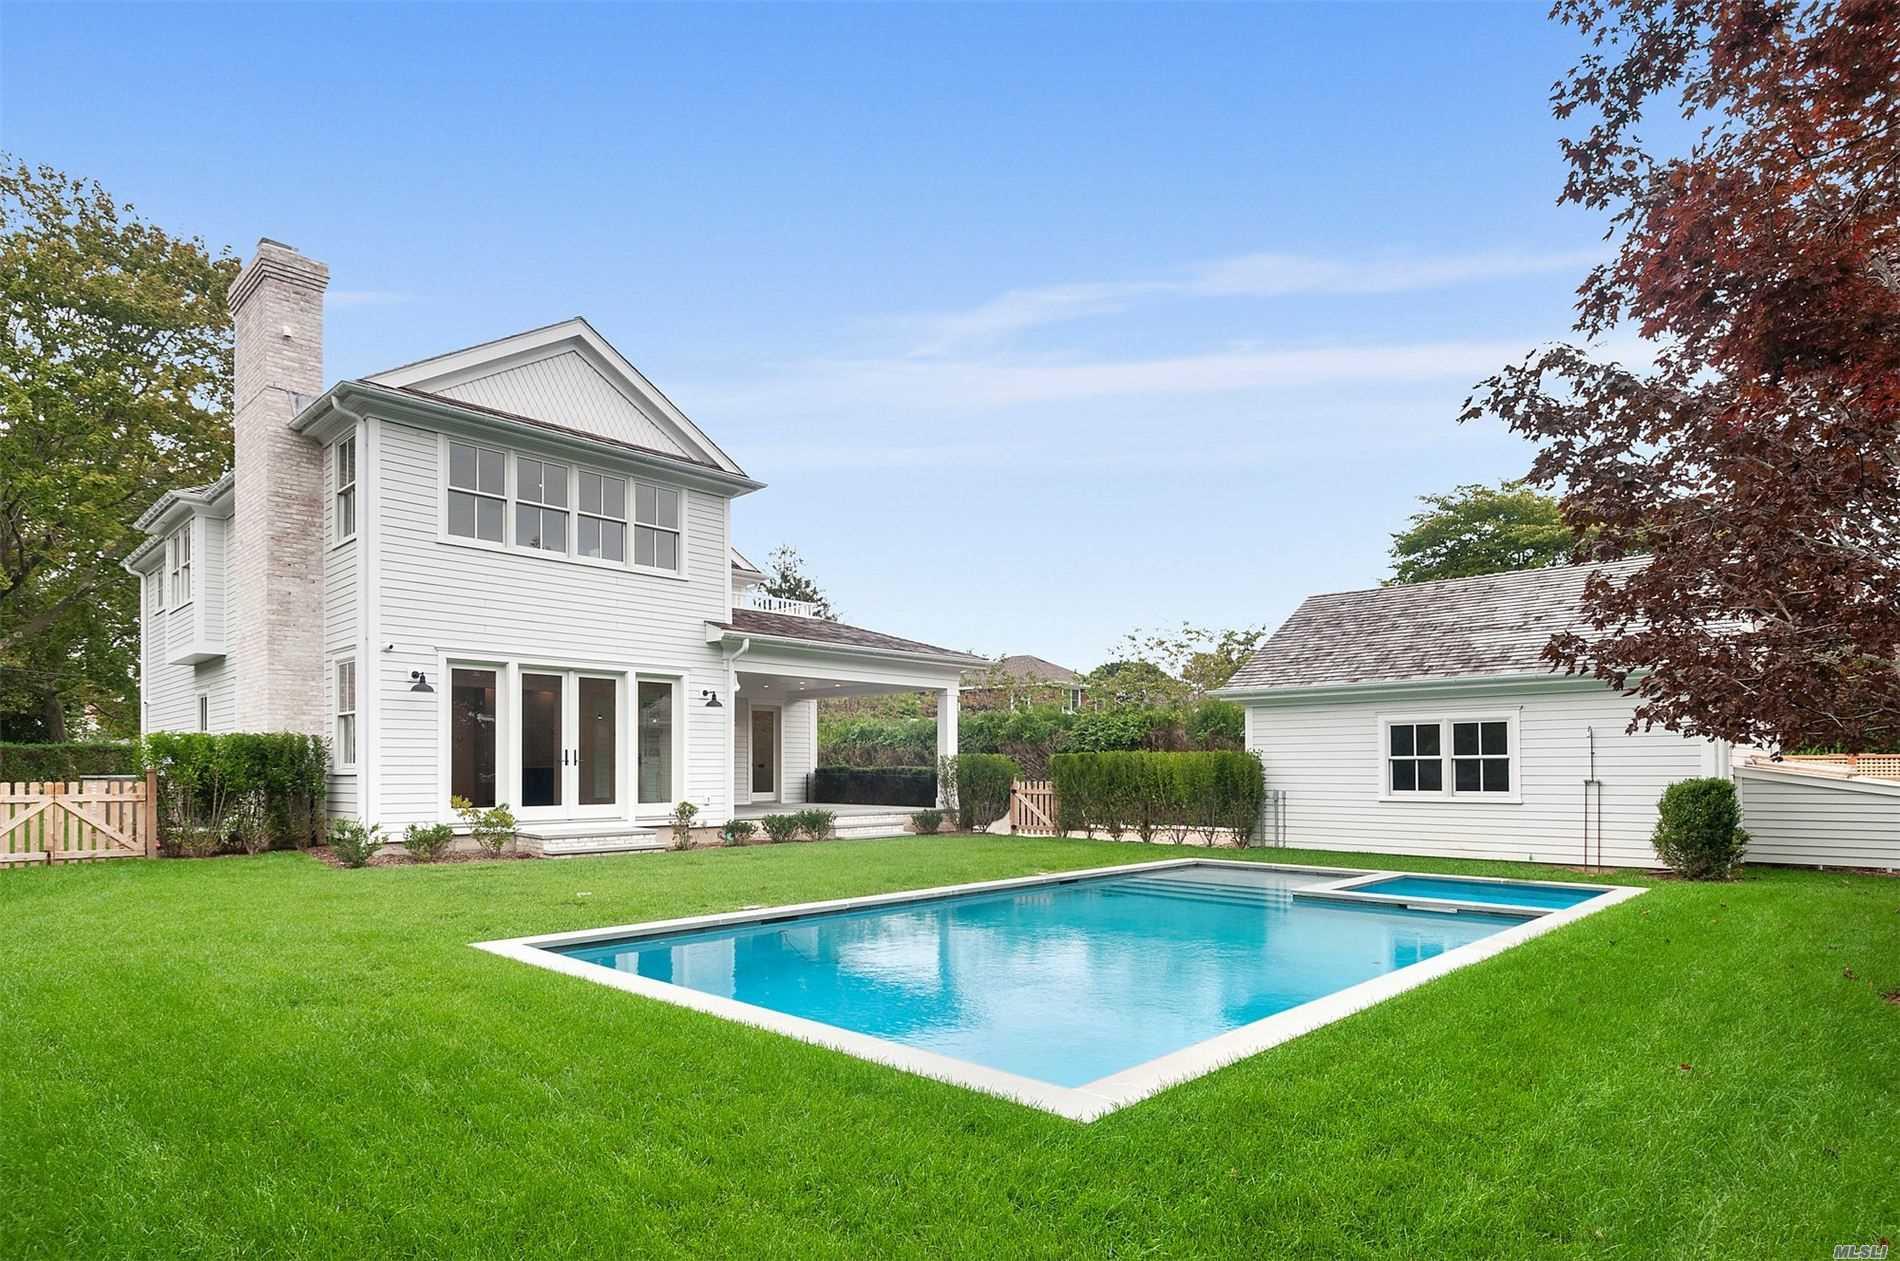 Photo of home for sale at 120 Pelletreau St, Southampton NY